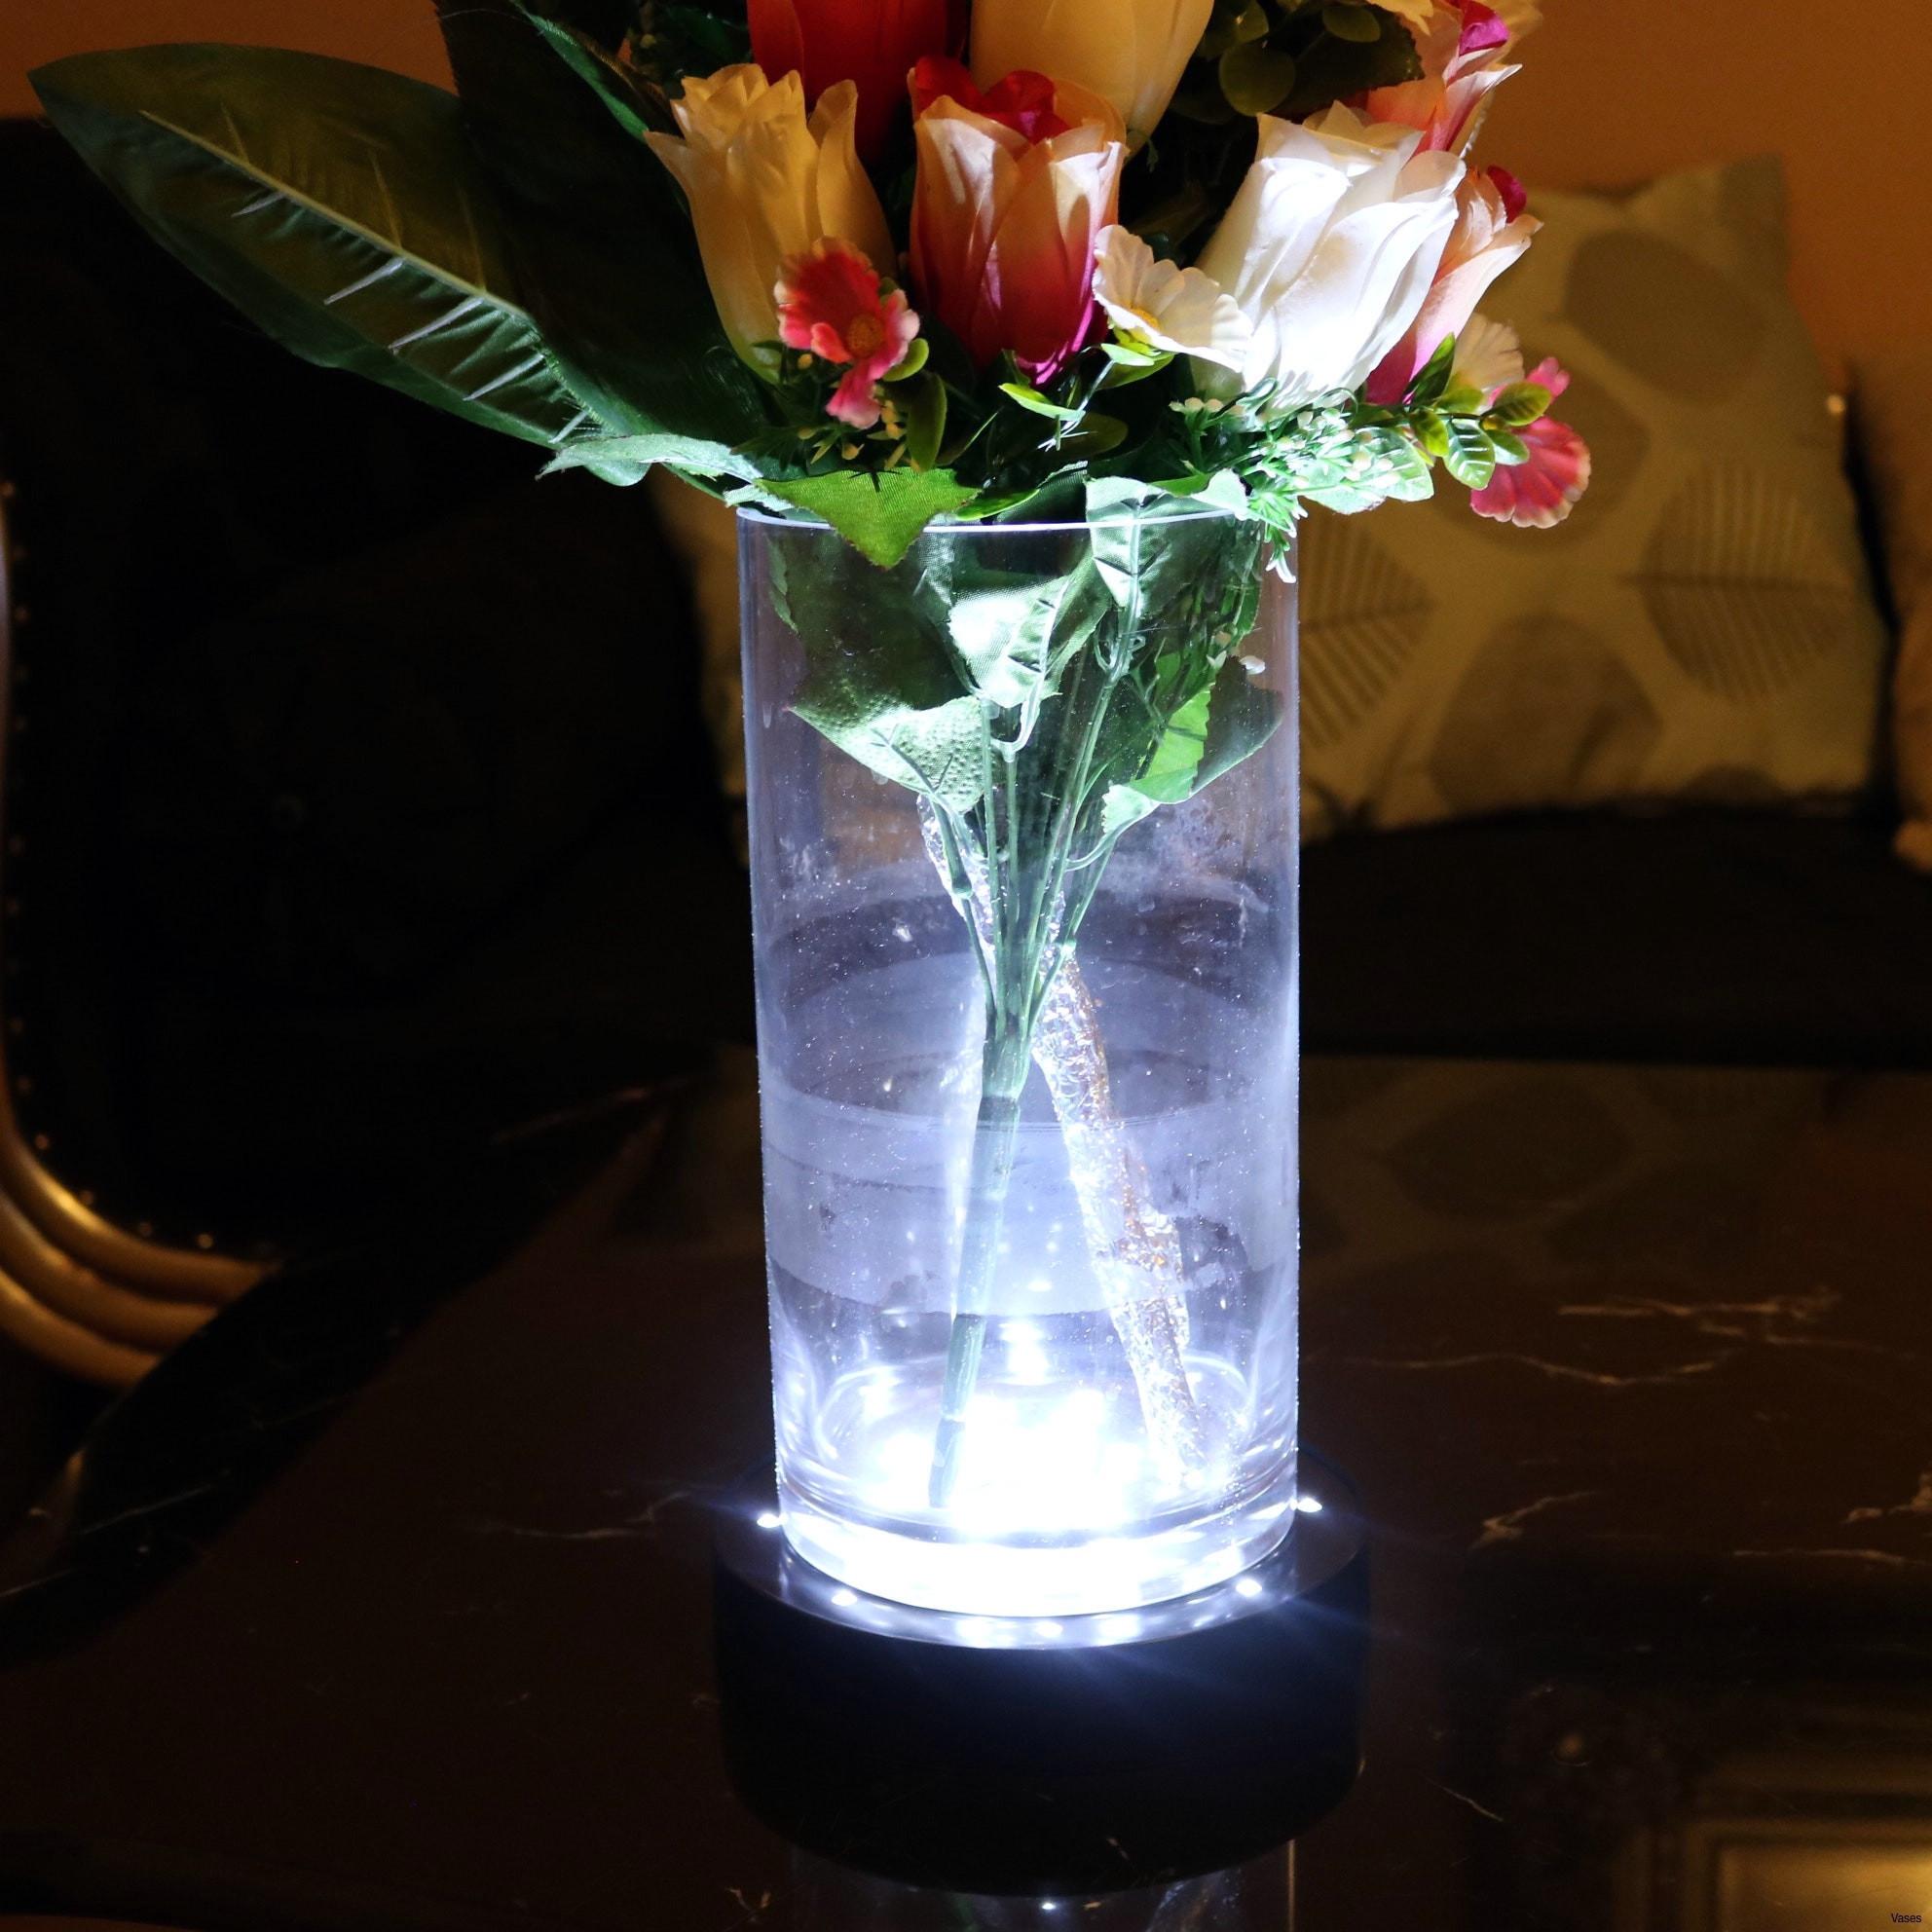 vw beetle vase of 25 luxury flower vase painting watercolor flower decoration ideas pertaining to flower vase painting watercolor lovely painting with food coloring unique fish perch watercolor art print